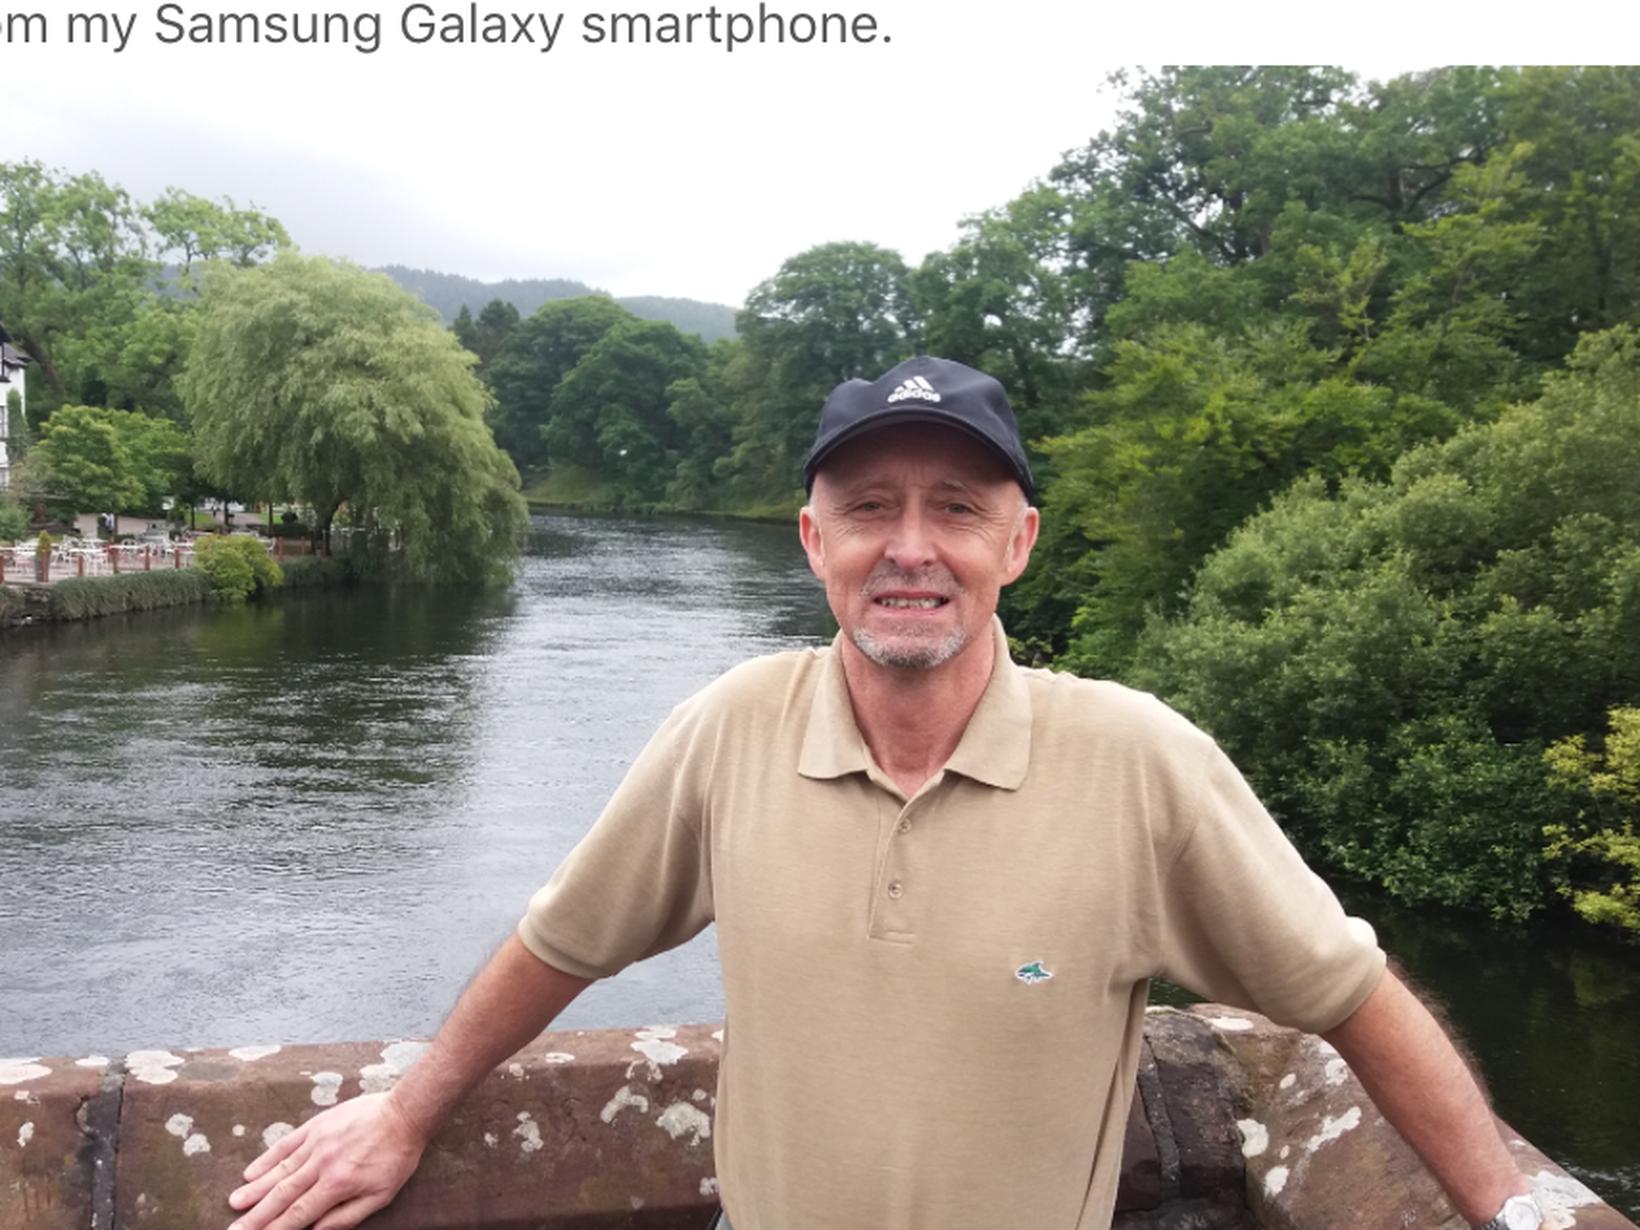 William from Leeds, United Kingdom